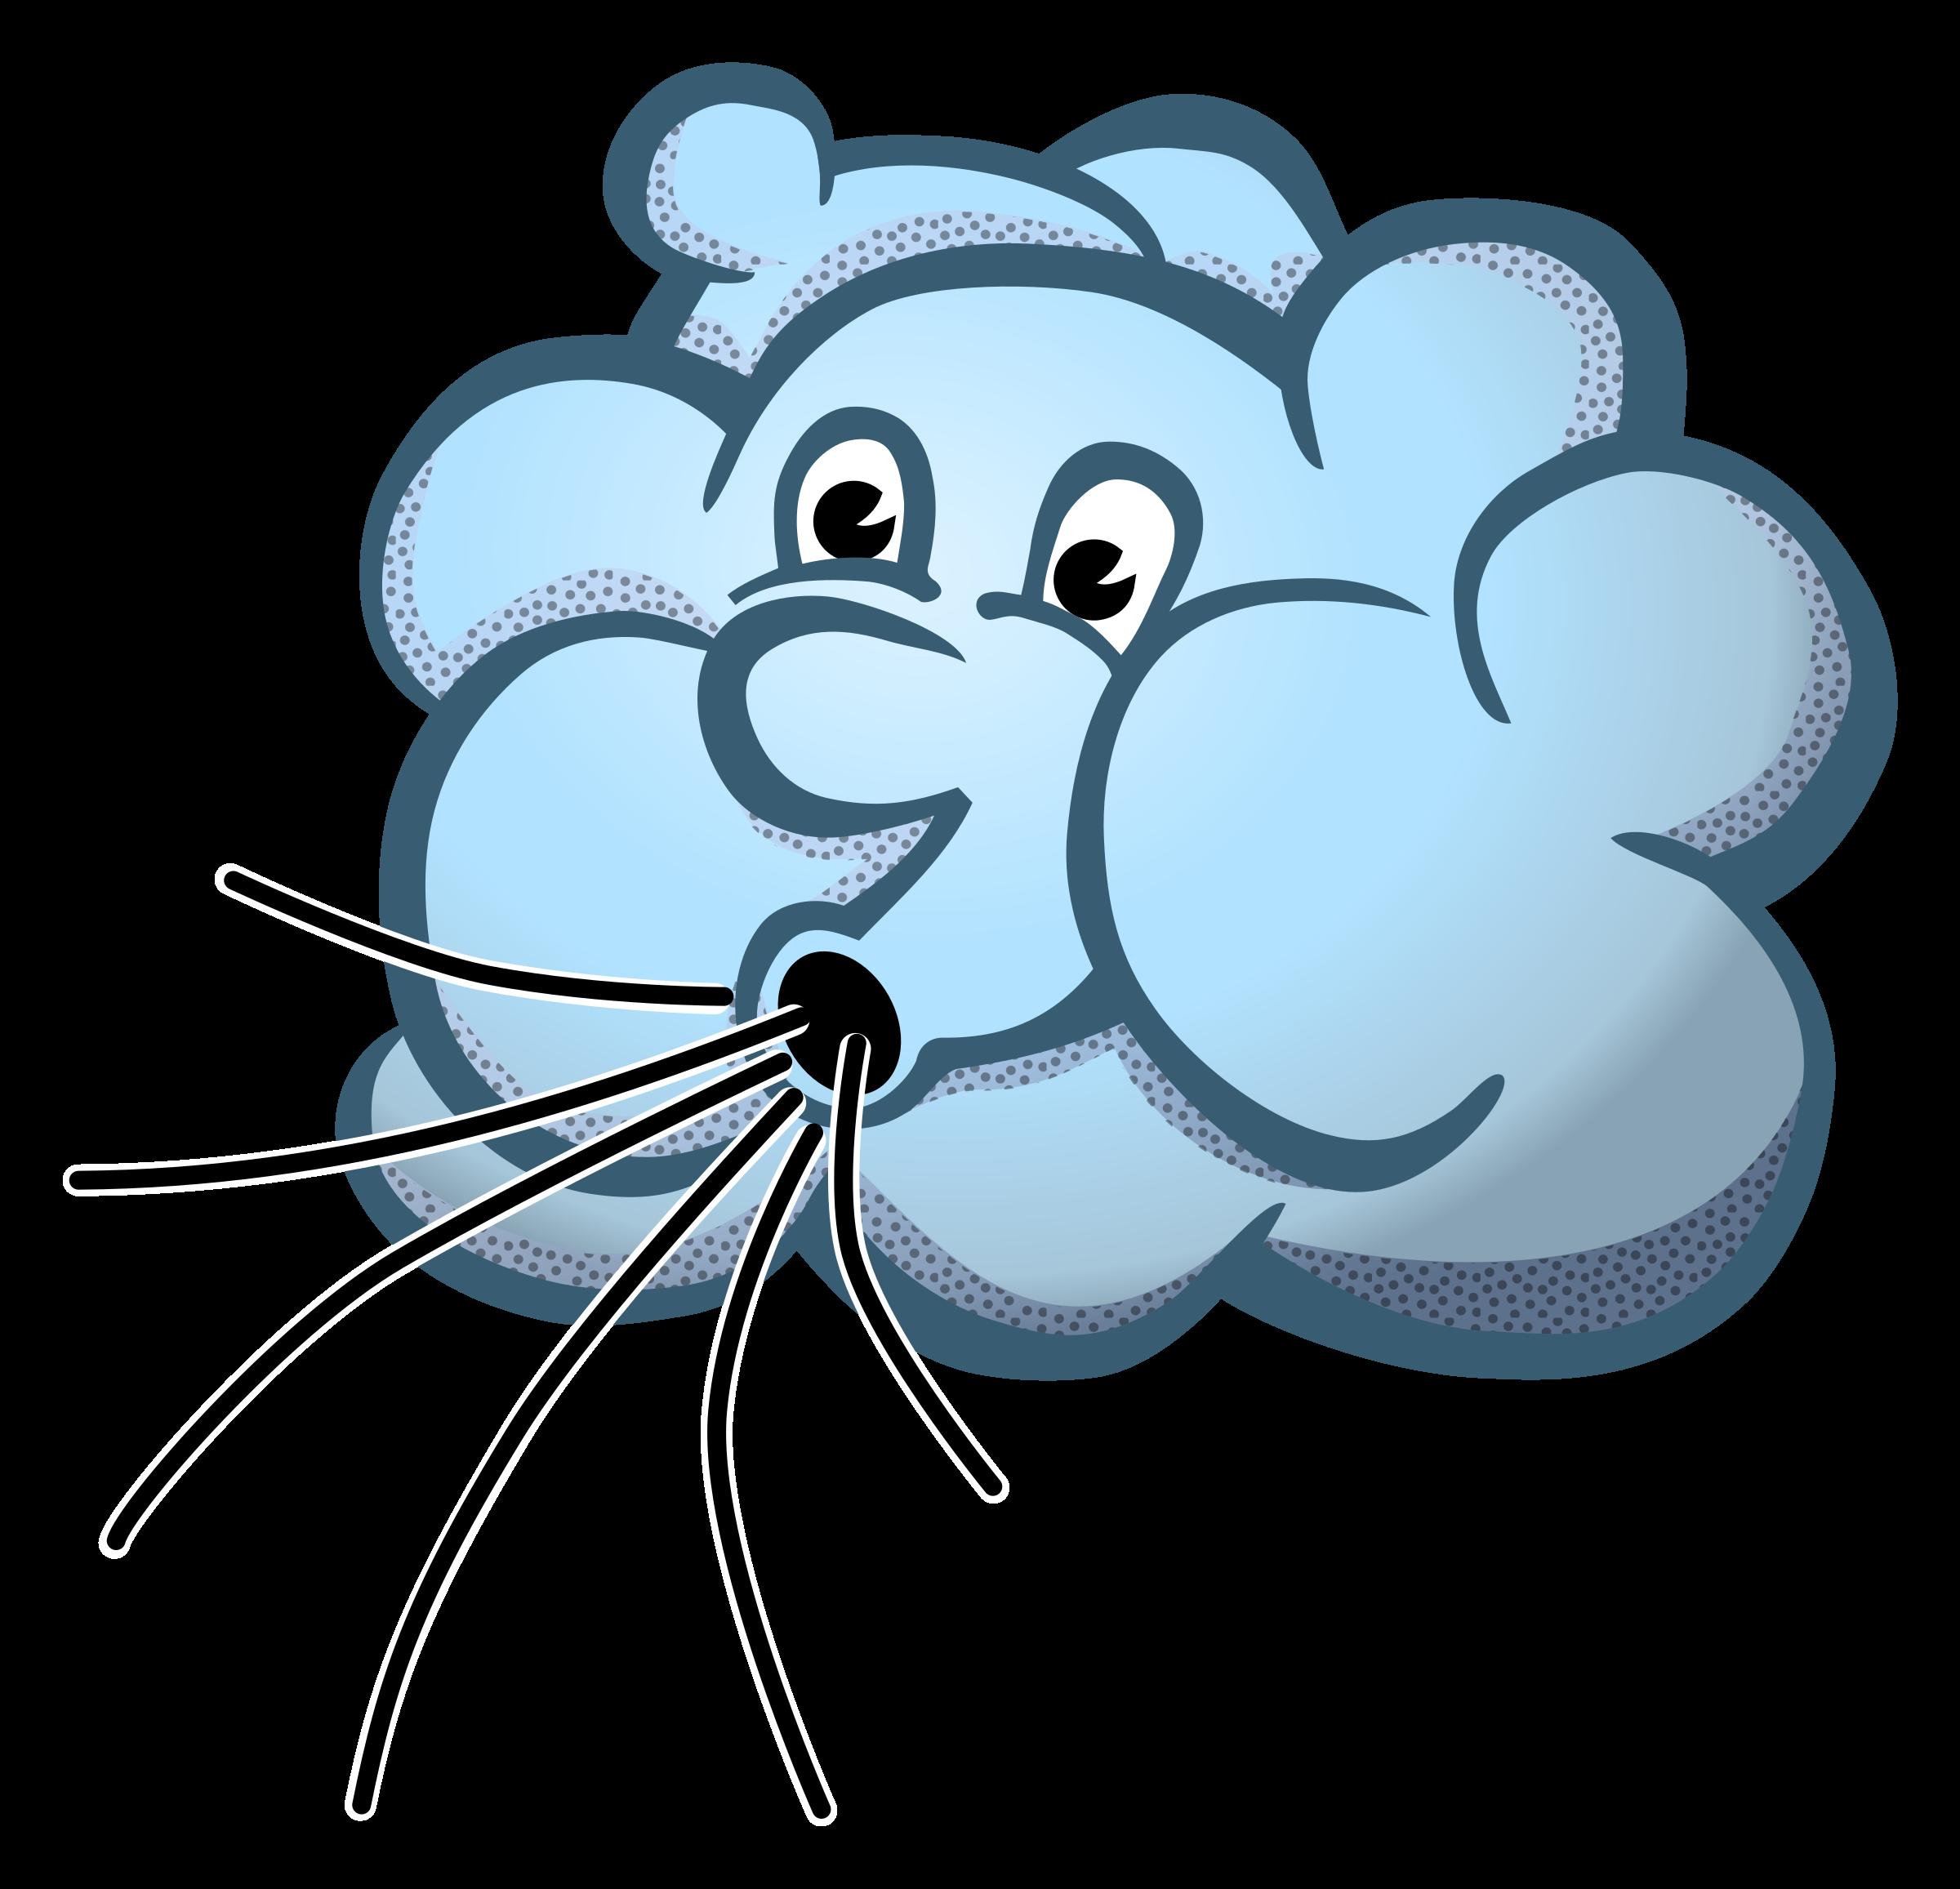 Windy clip art clipart wikiclipart 2 wikiclipart